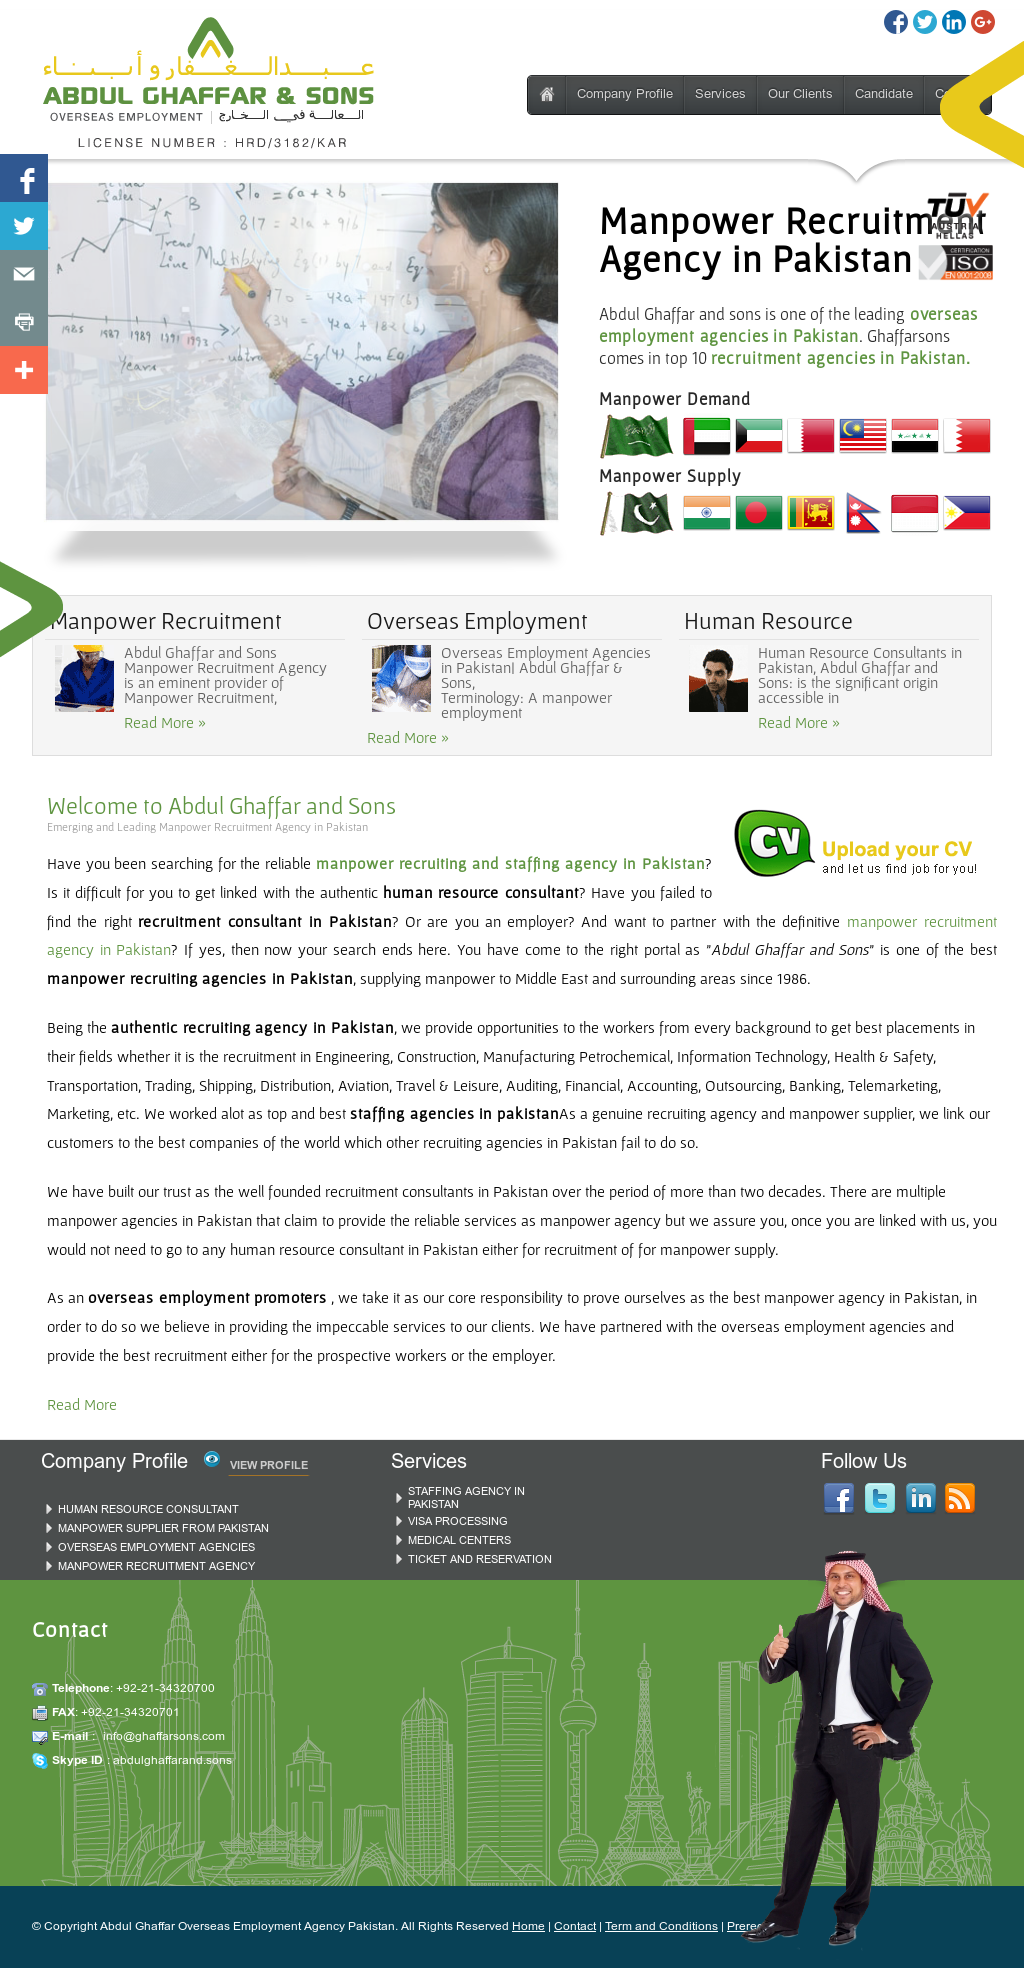 Abdul Ghaffar & Sons Overseas Employment Competitors